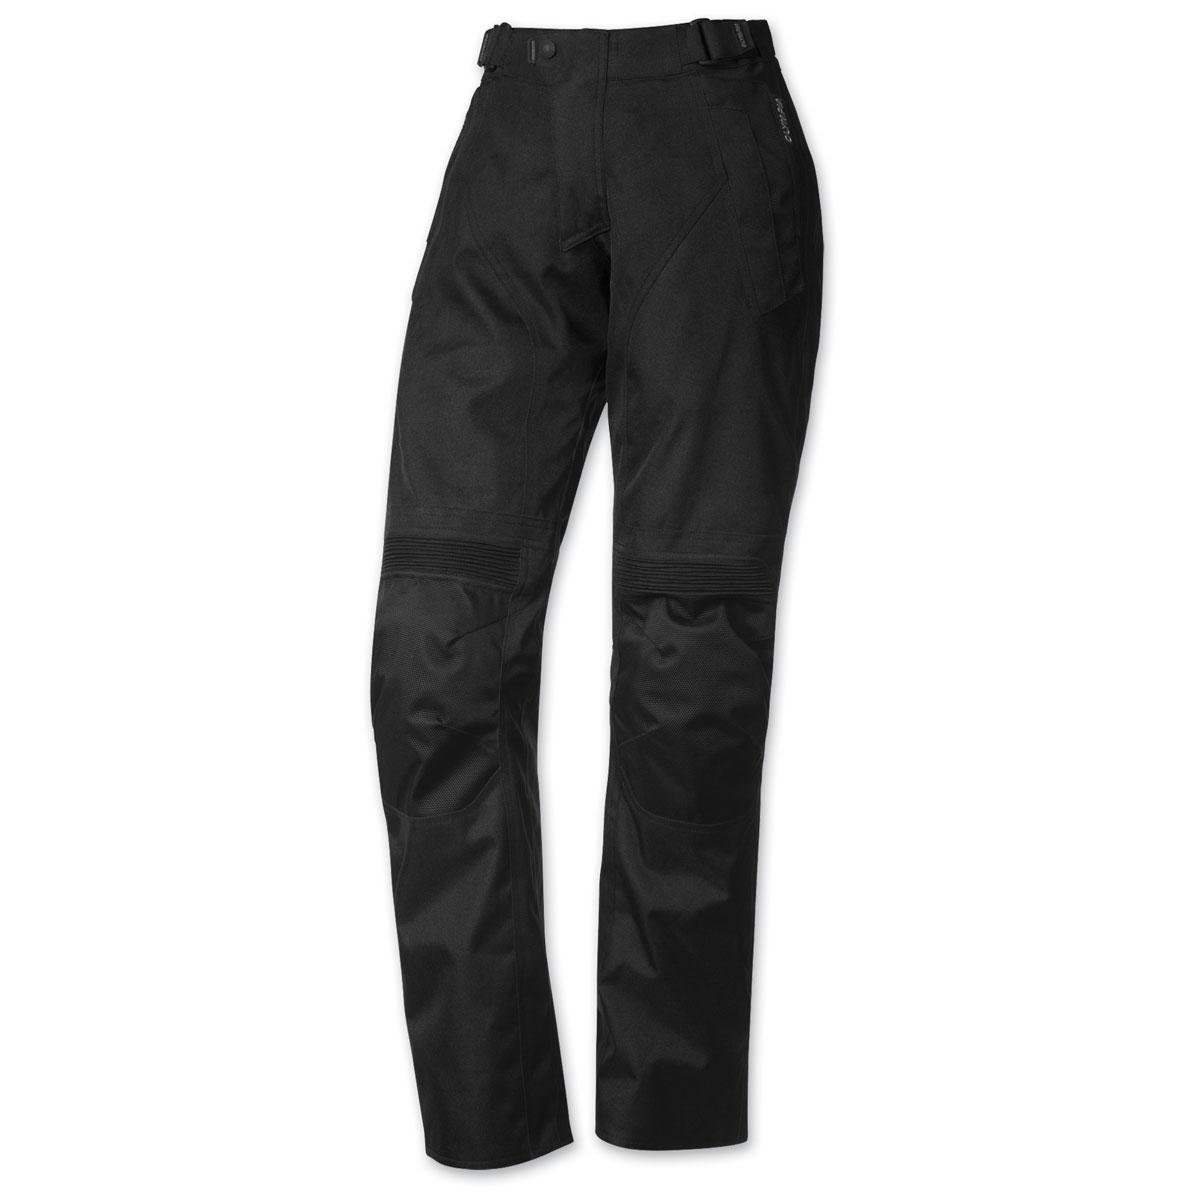 Olympia Moto Sports Women's Sentry 3 Black Pants